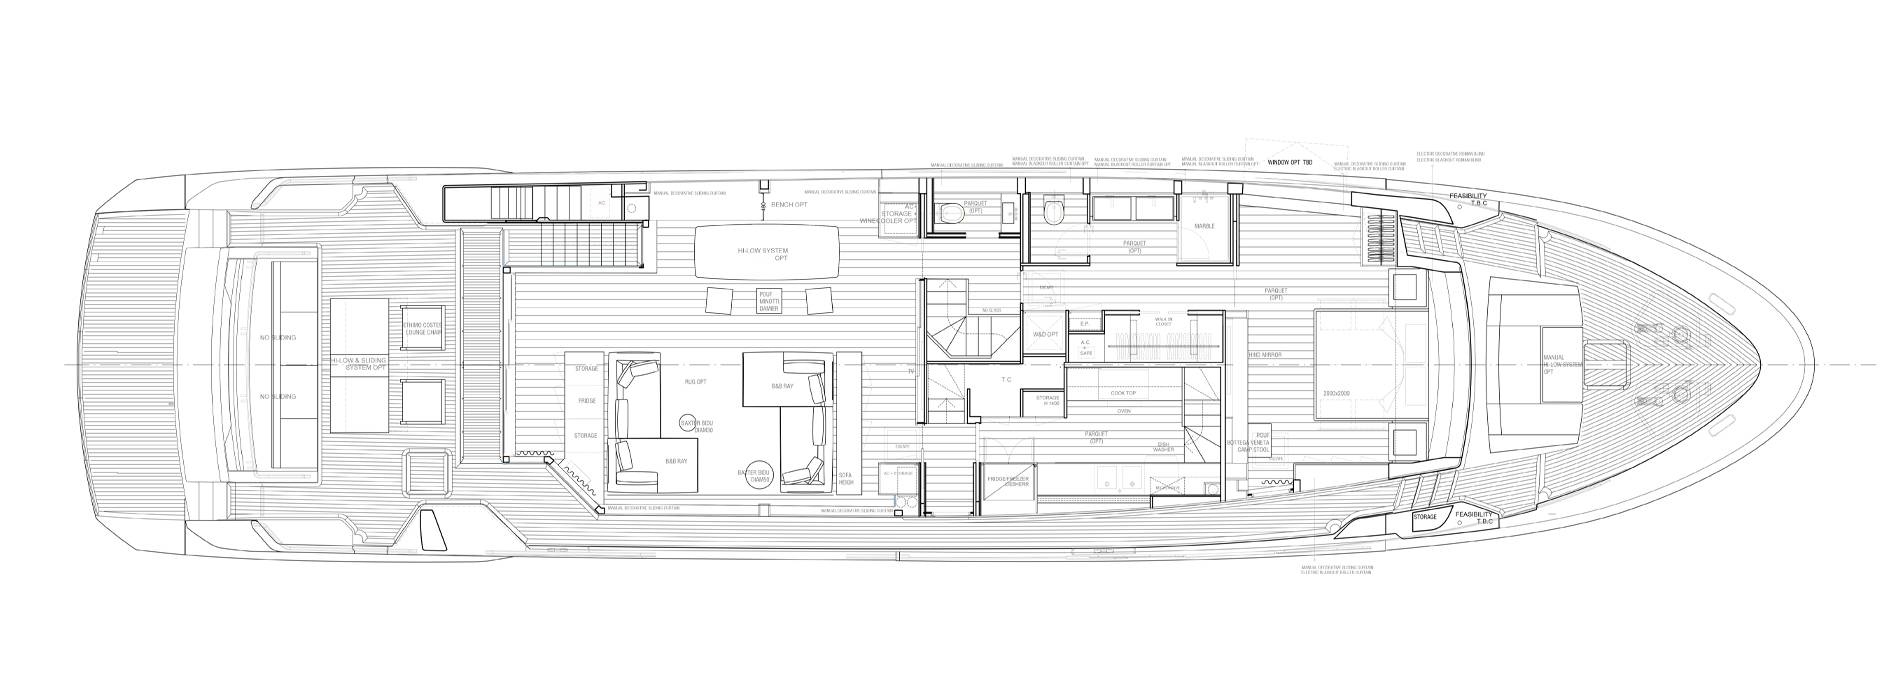 Sanlorenzo Yachts SL102A-746 Главная палуба